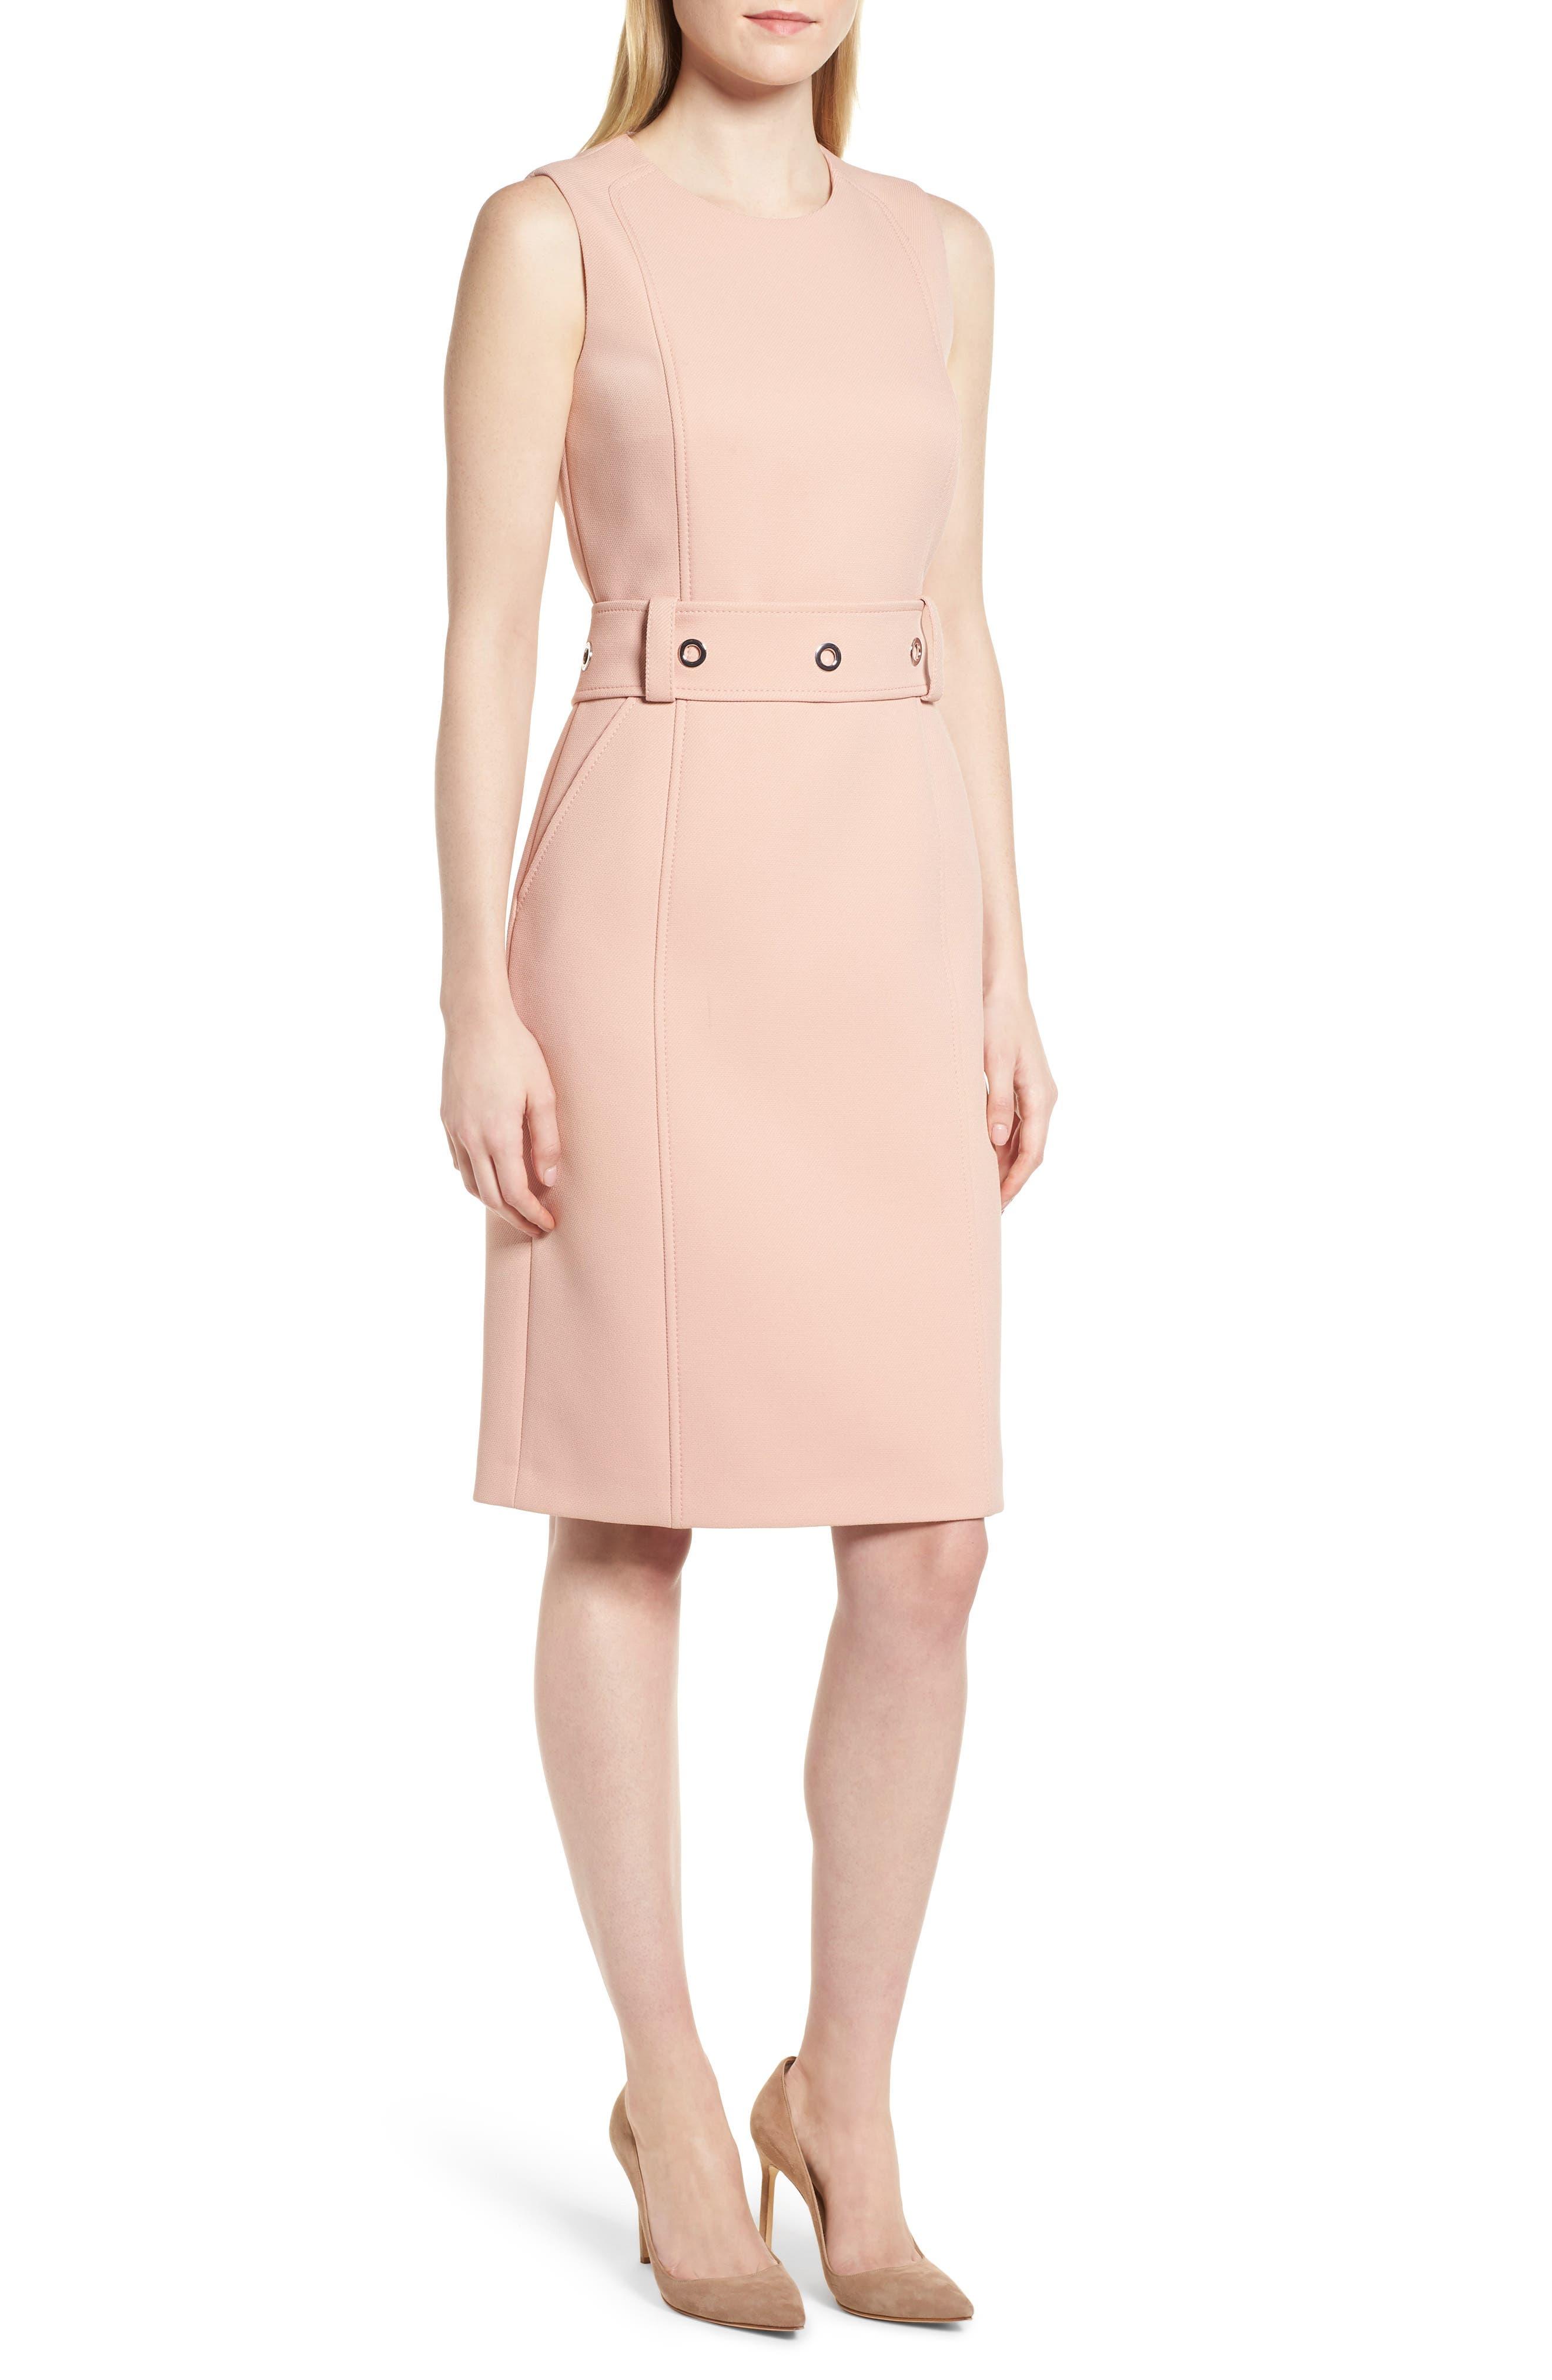 Duleama Compact Twill Dress,                         Main,                         color, 682